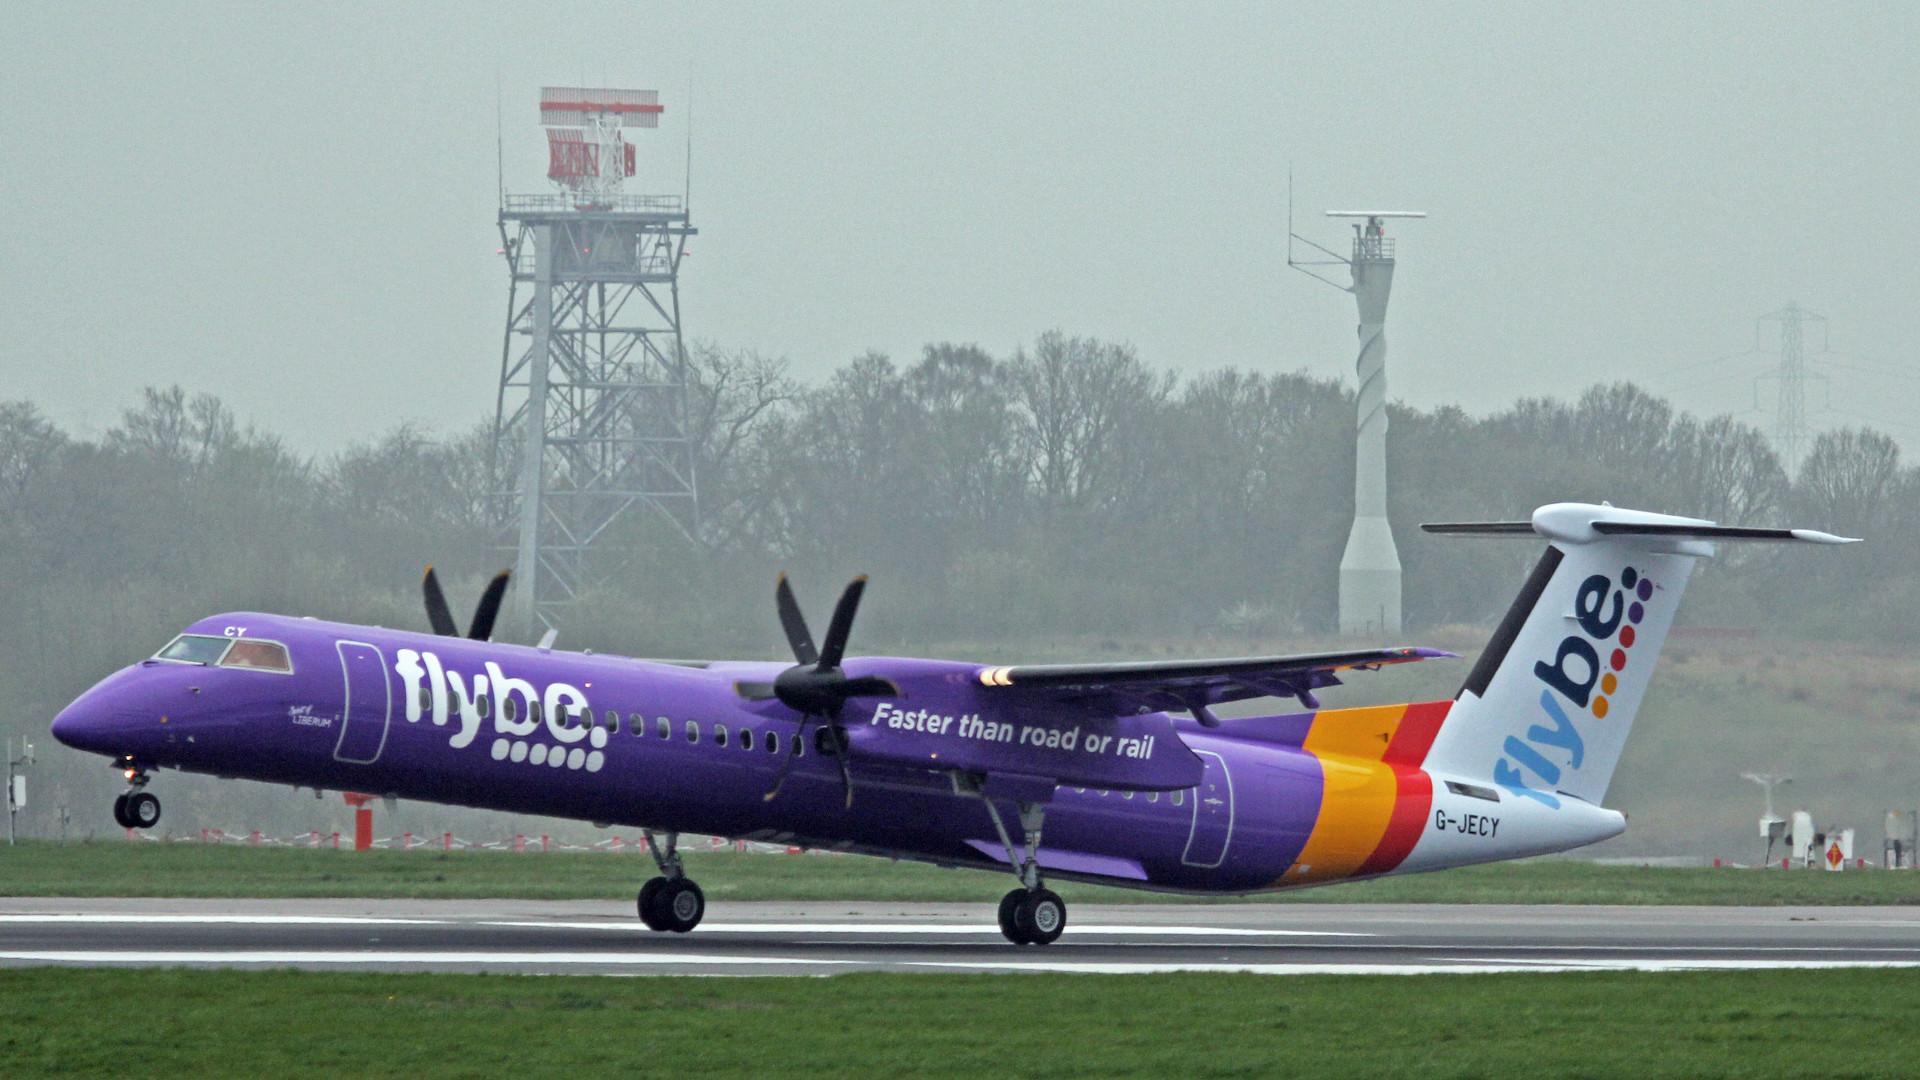 FlyBE Dash8-Q400 Photo Credit: Ken Fielding via Wikmedia Commons